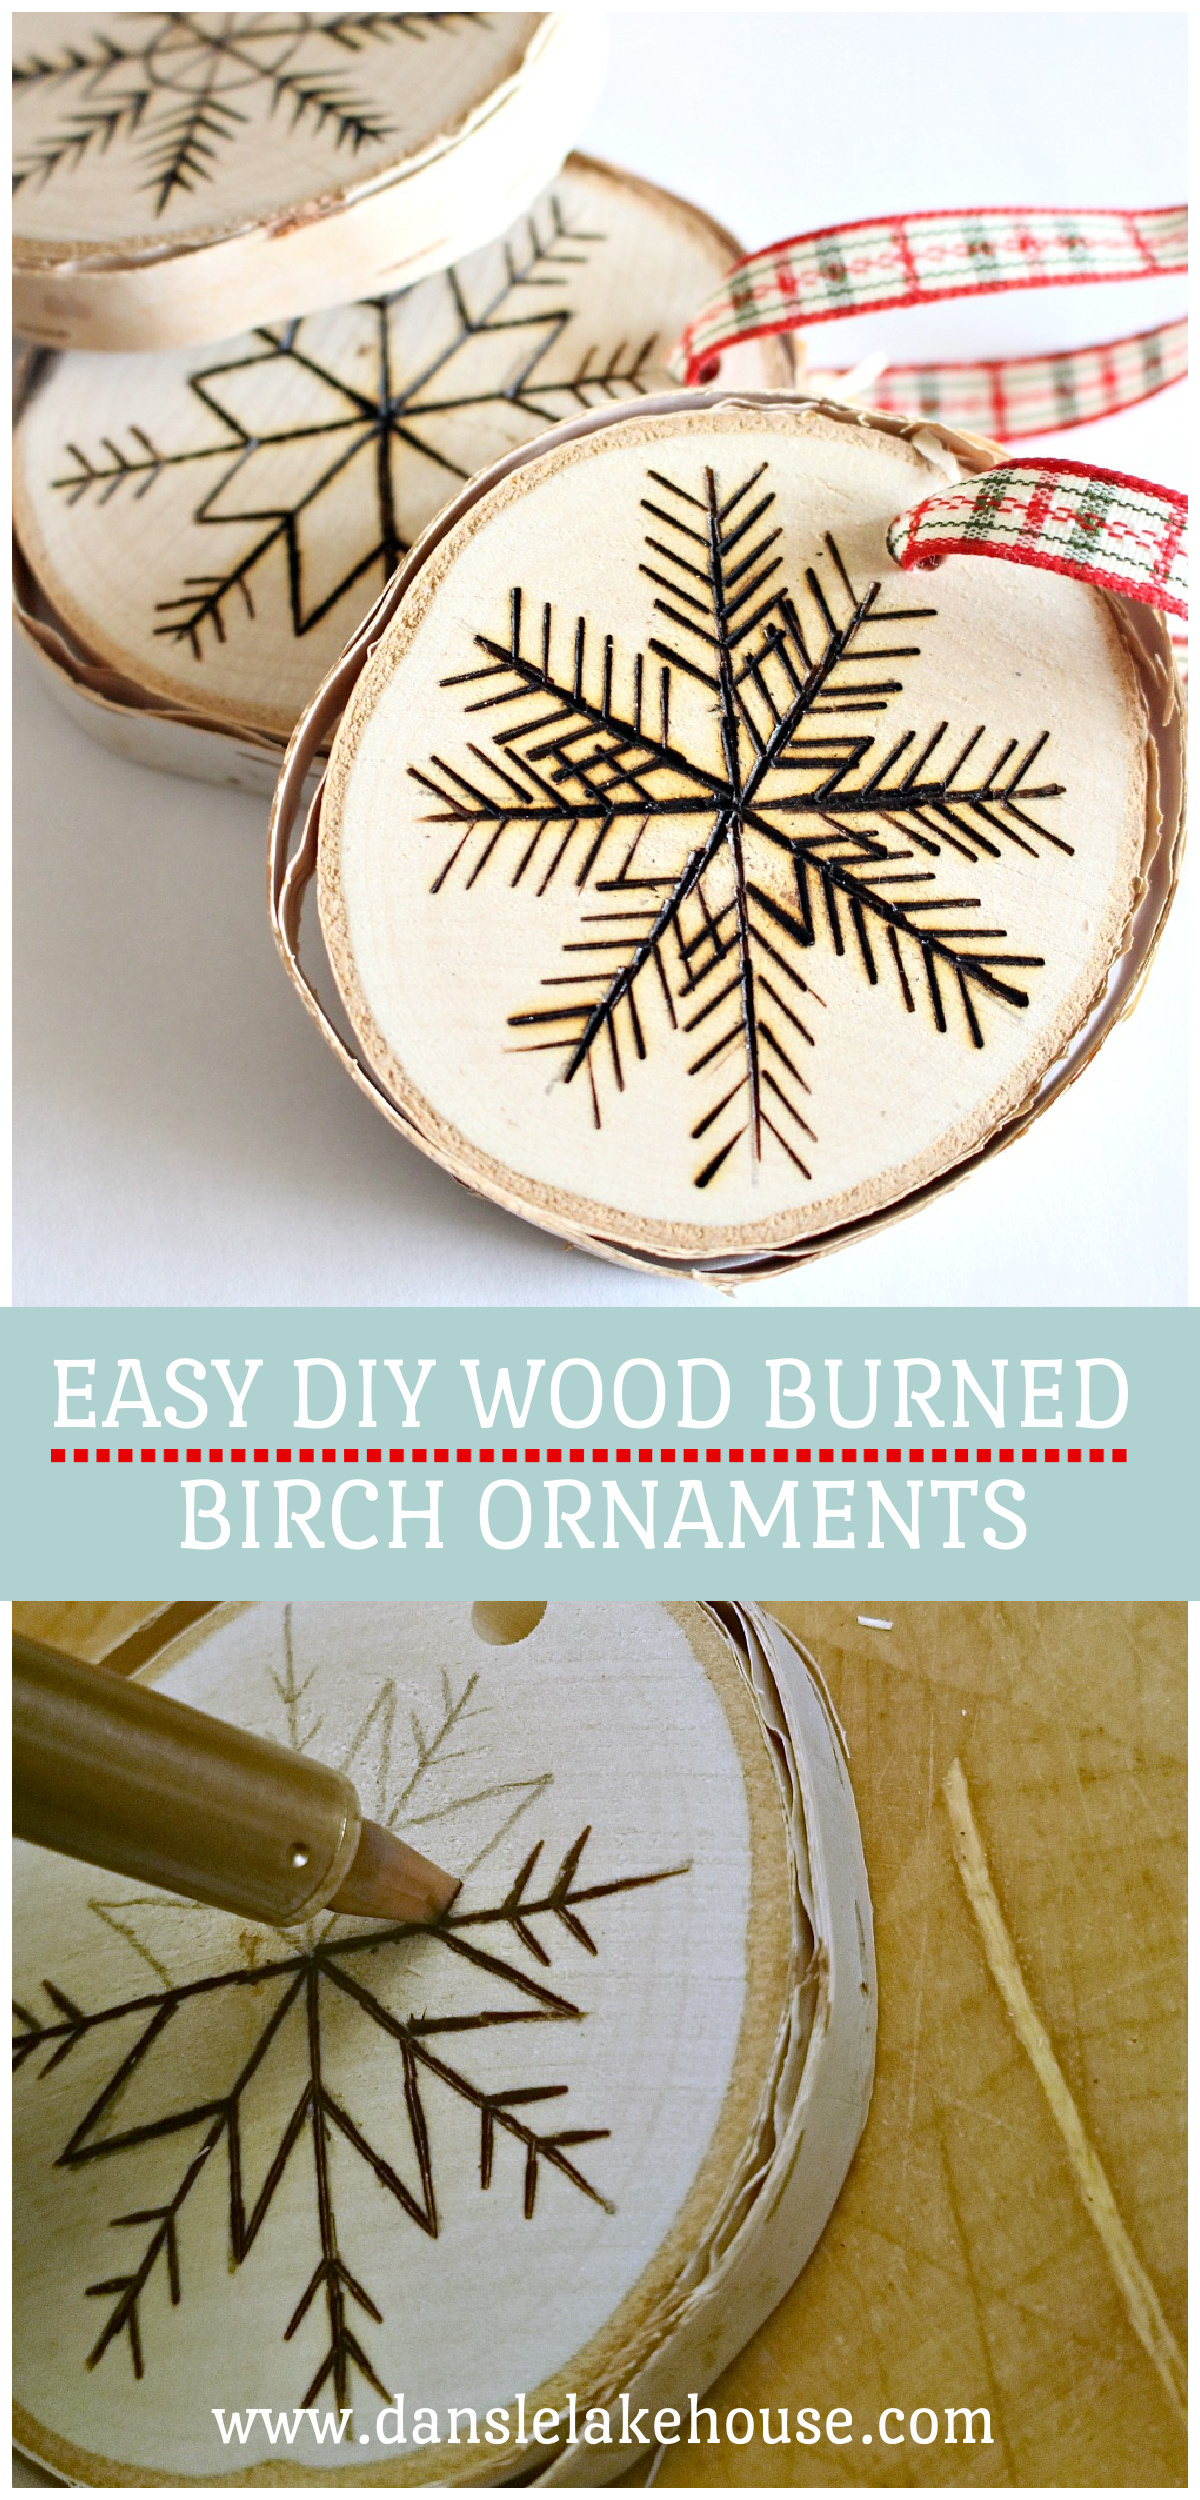 Easy DIY Wood Burned Ornaments